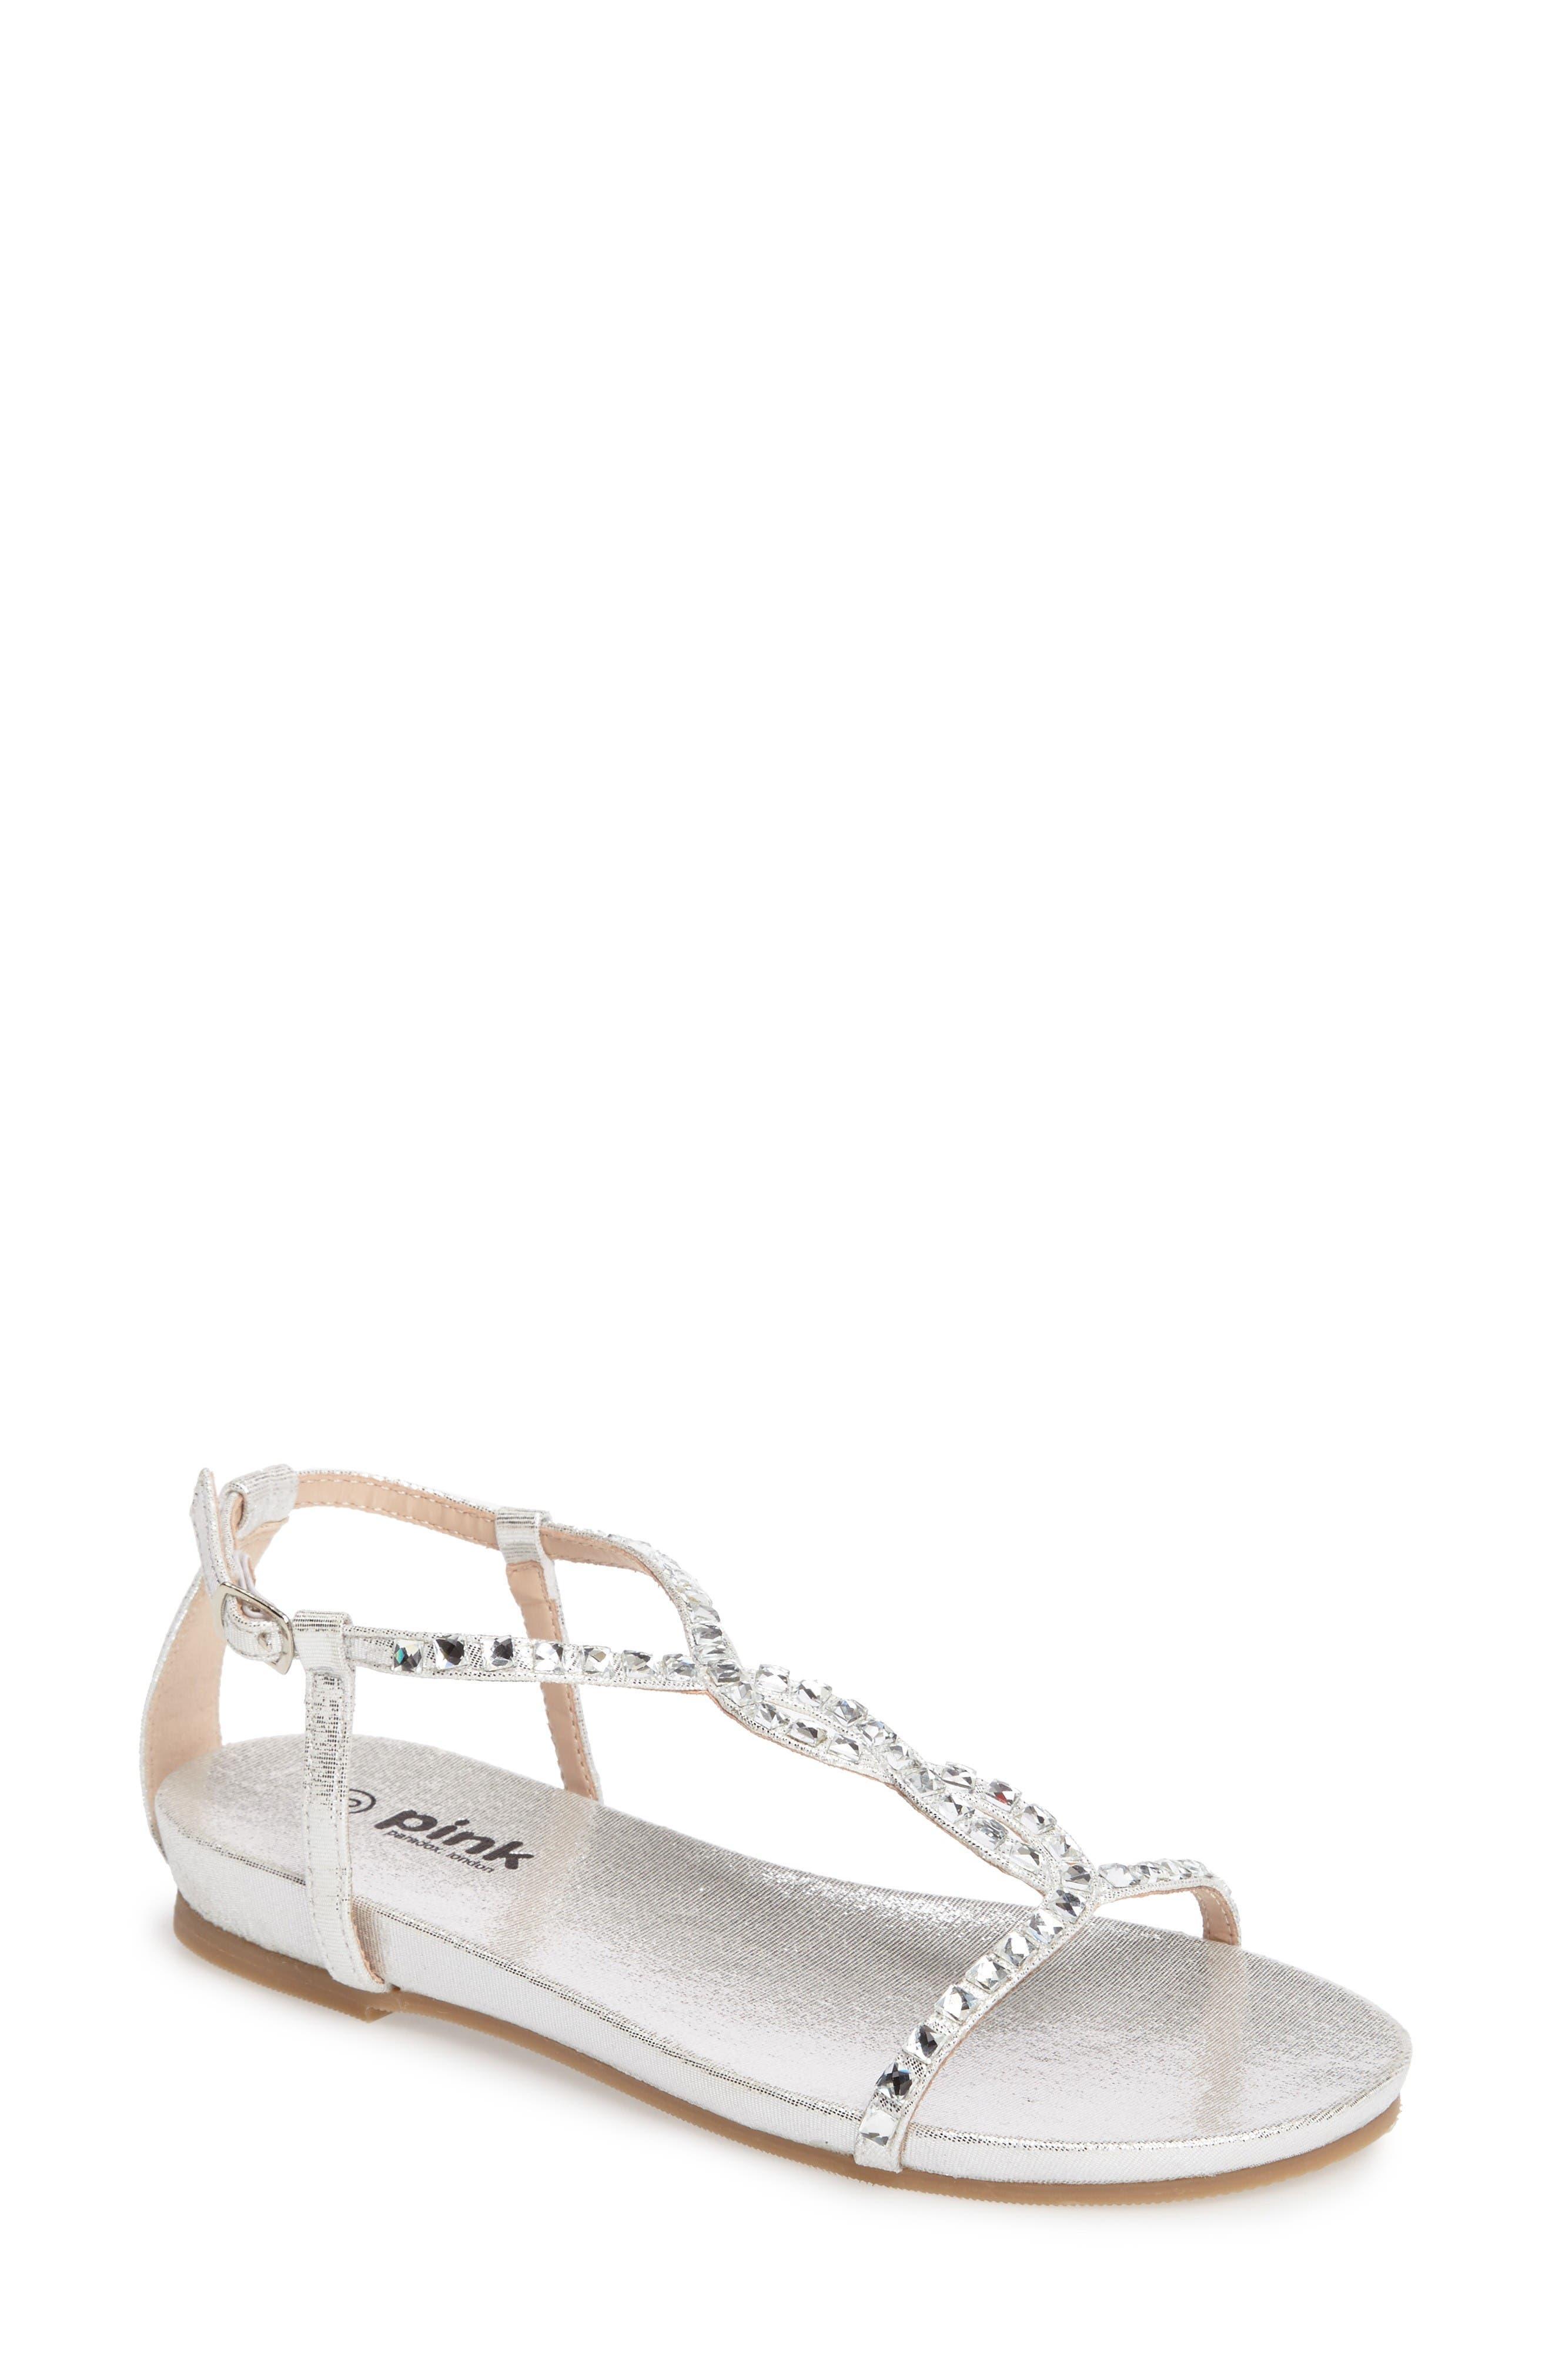 Alternate Image 1 Selected - pink paradox london Kaylee Ankle Strap Sandal